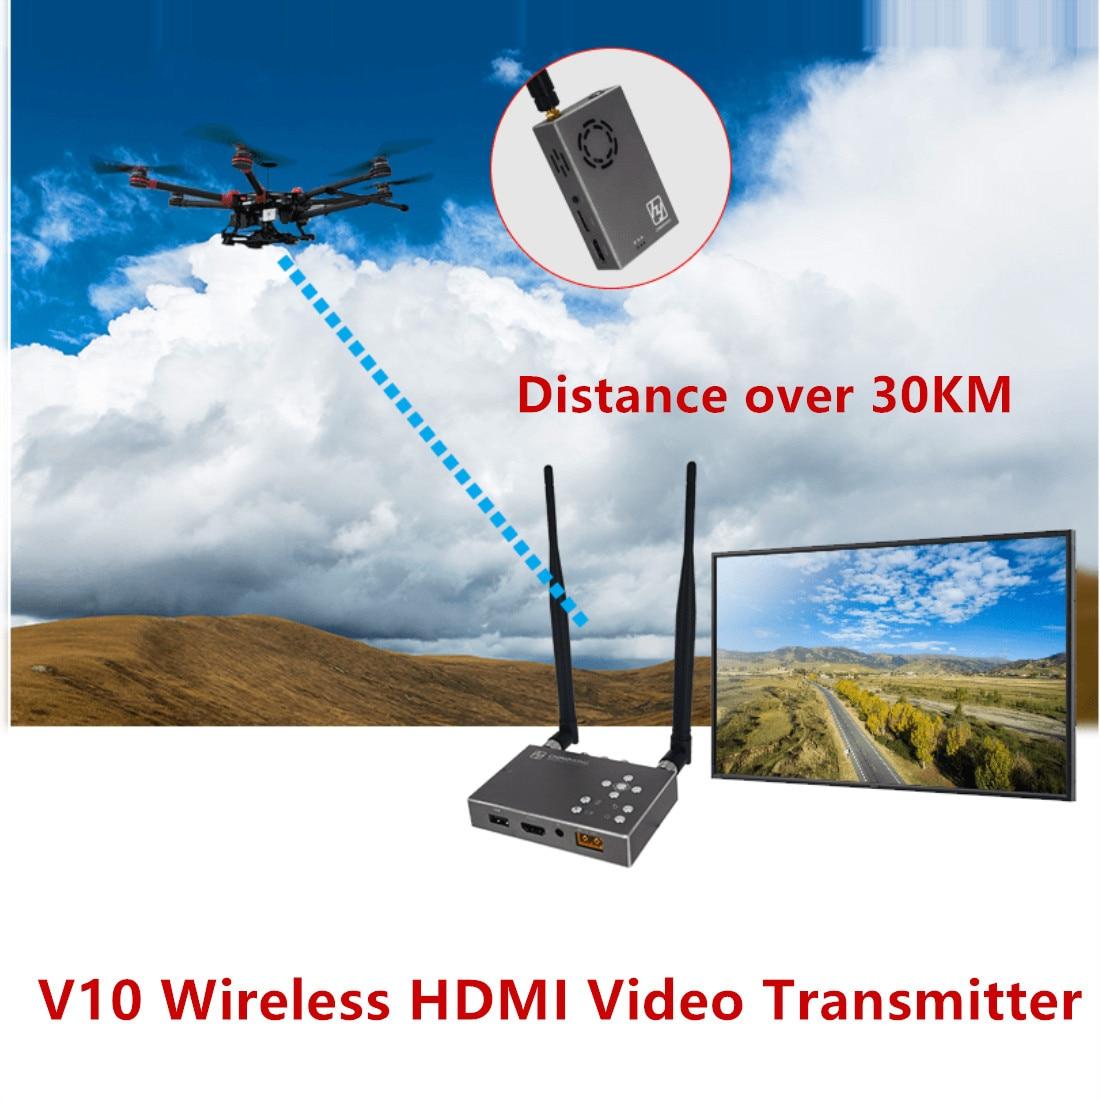 Over 30KM Wireless HDMI image Transmission